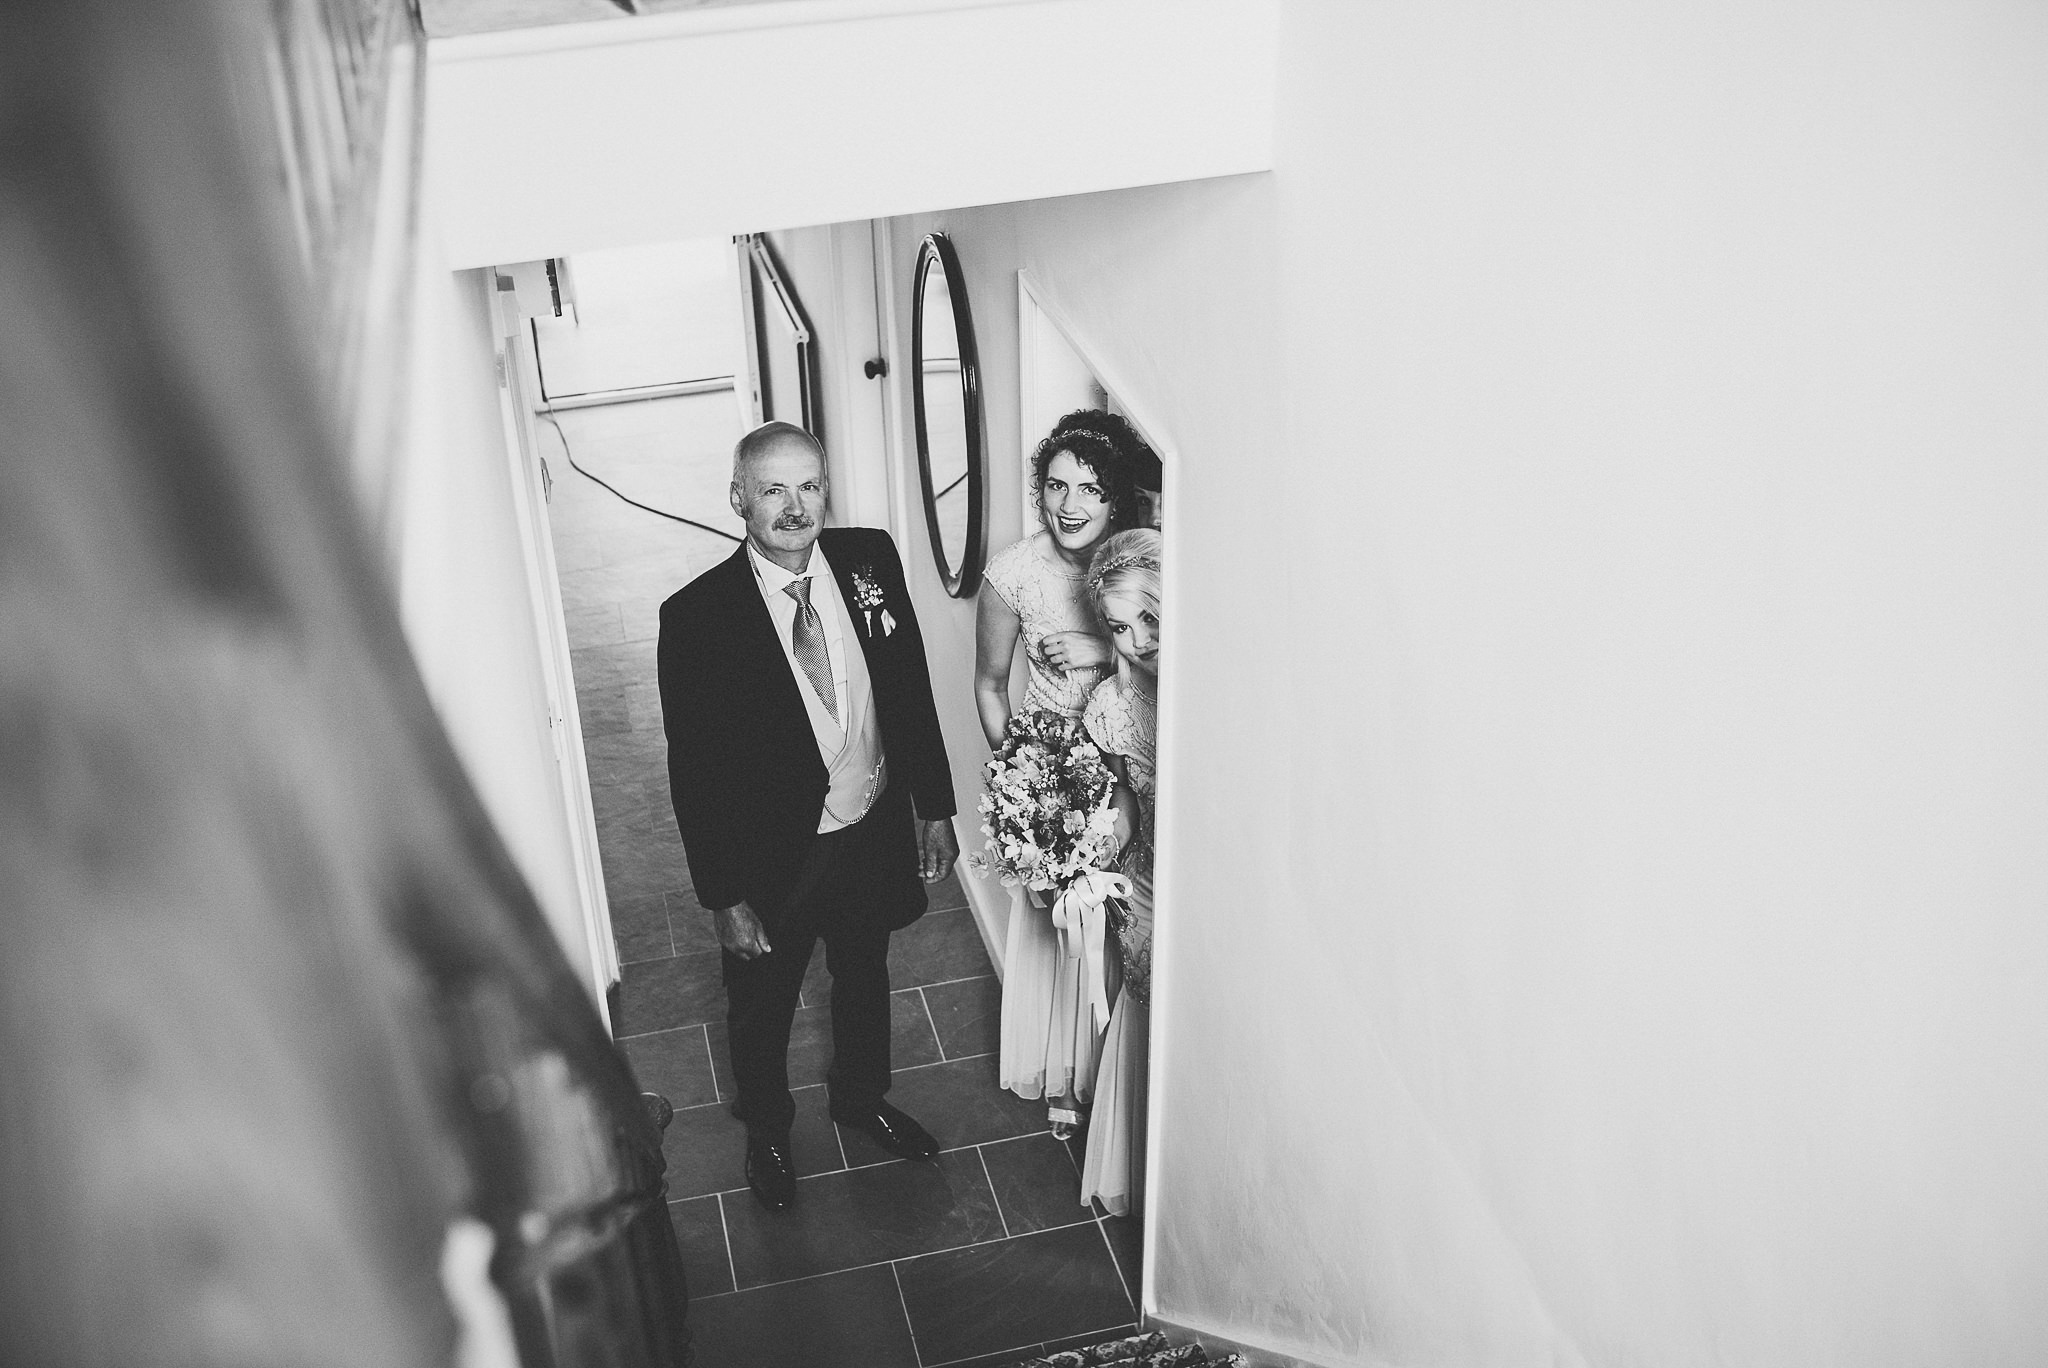 paul-marbrook-Farm-Wedding-Photographer-Lancashire-90019